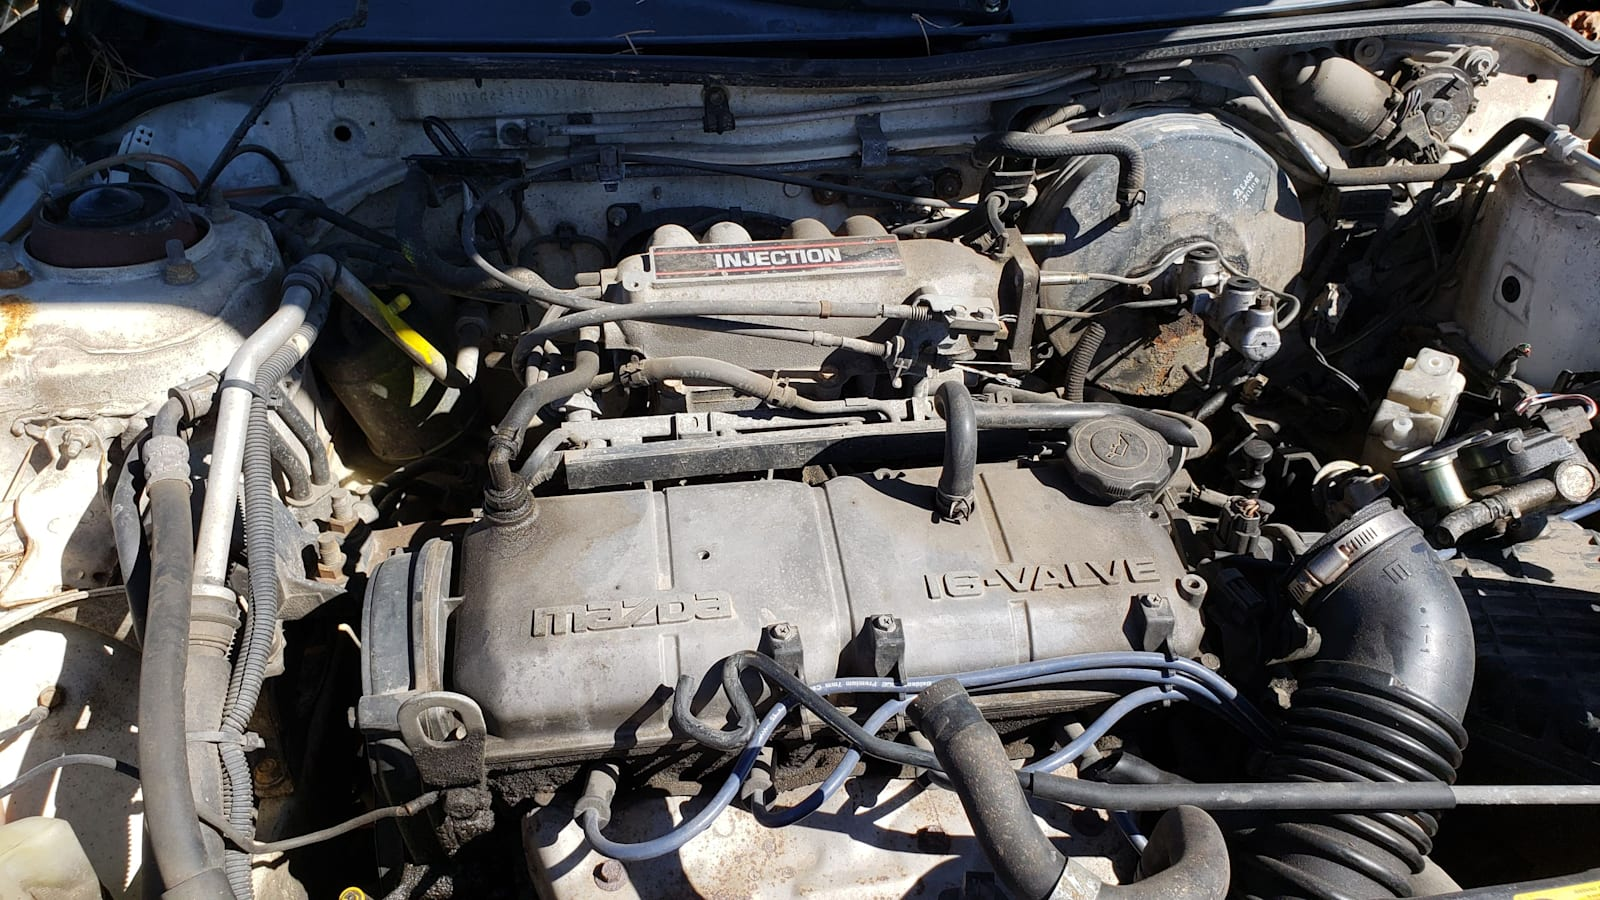 [DIAGRAM_38IU]  Junkyard Gem: 1992 Mazda MX-3 | Autoblog | Mazda Mx3 Engine Diagram |  | Autoblog